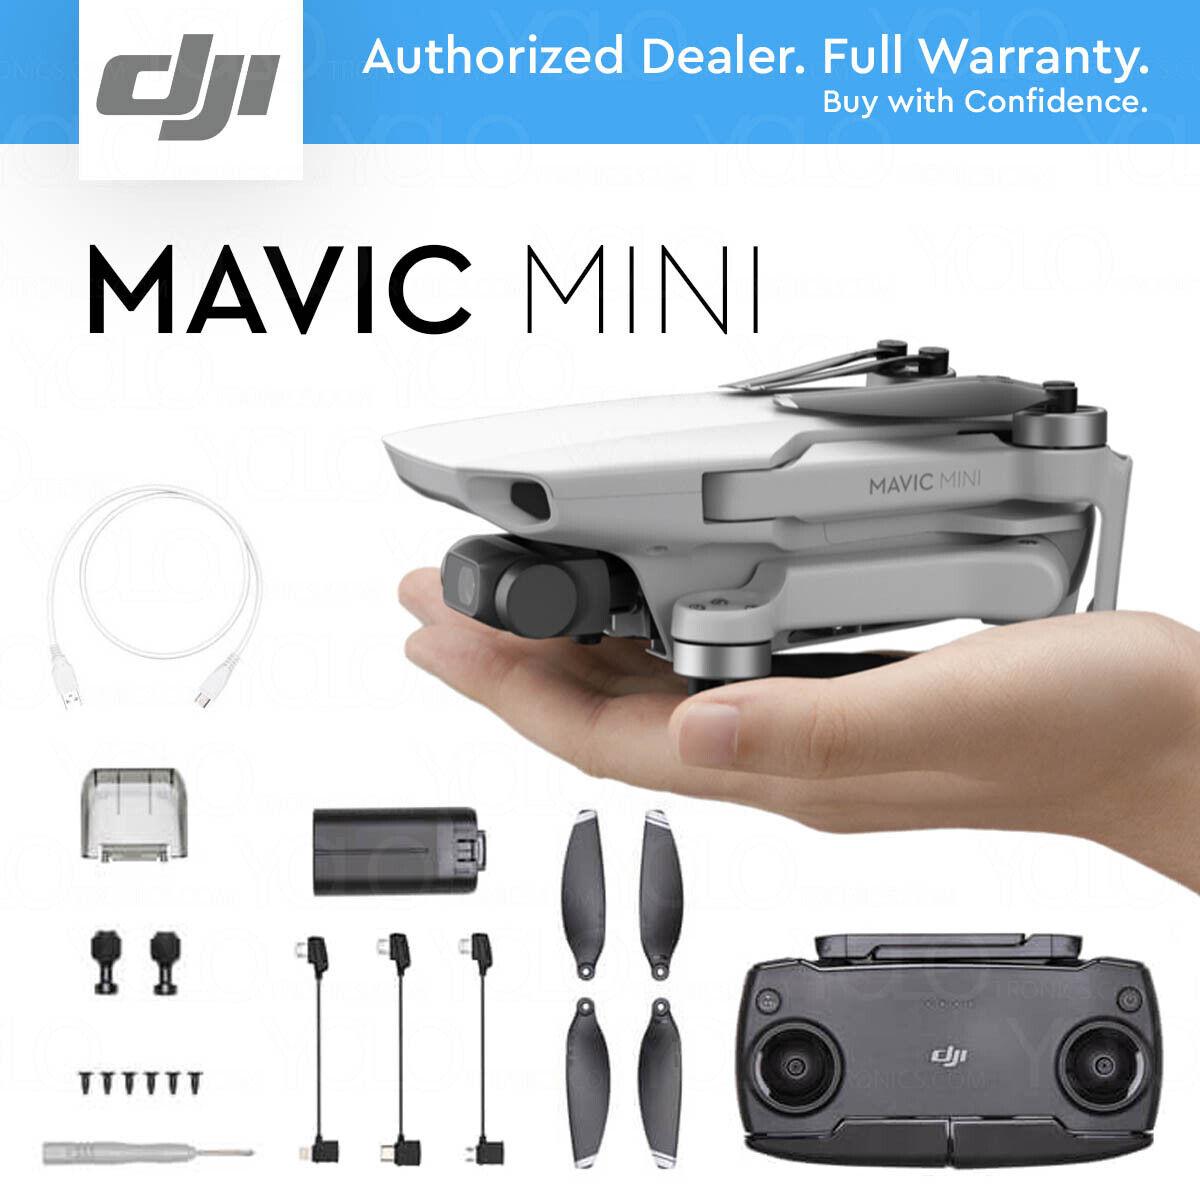 DJI MAVIC MINI DRONE 12MP 2.7K...